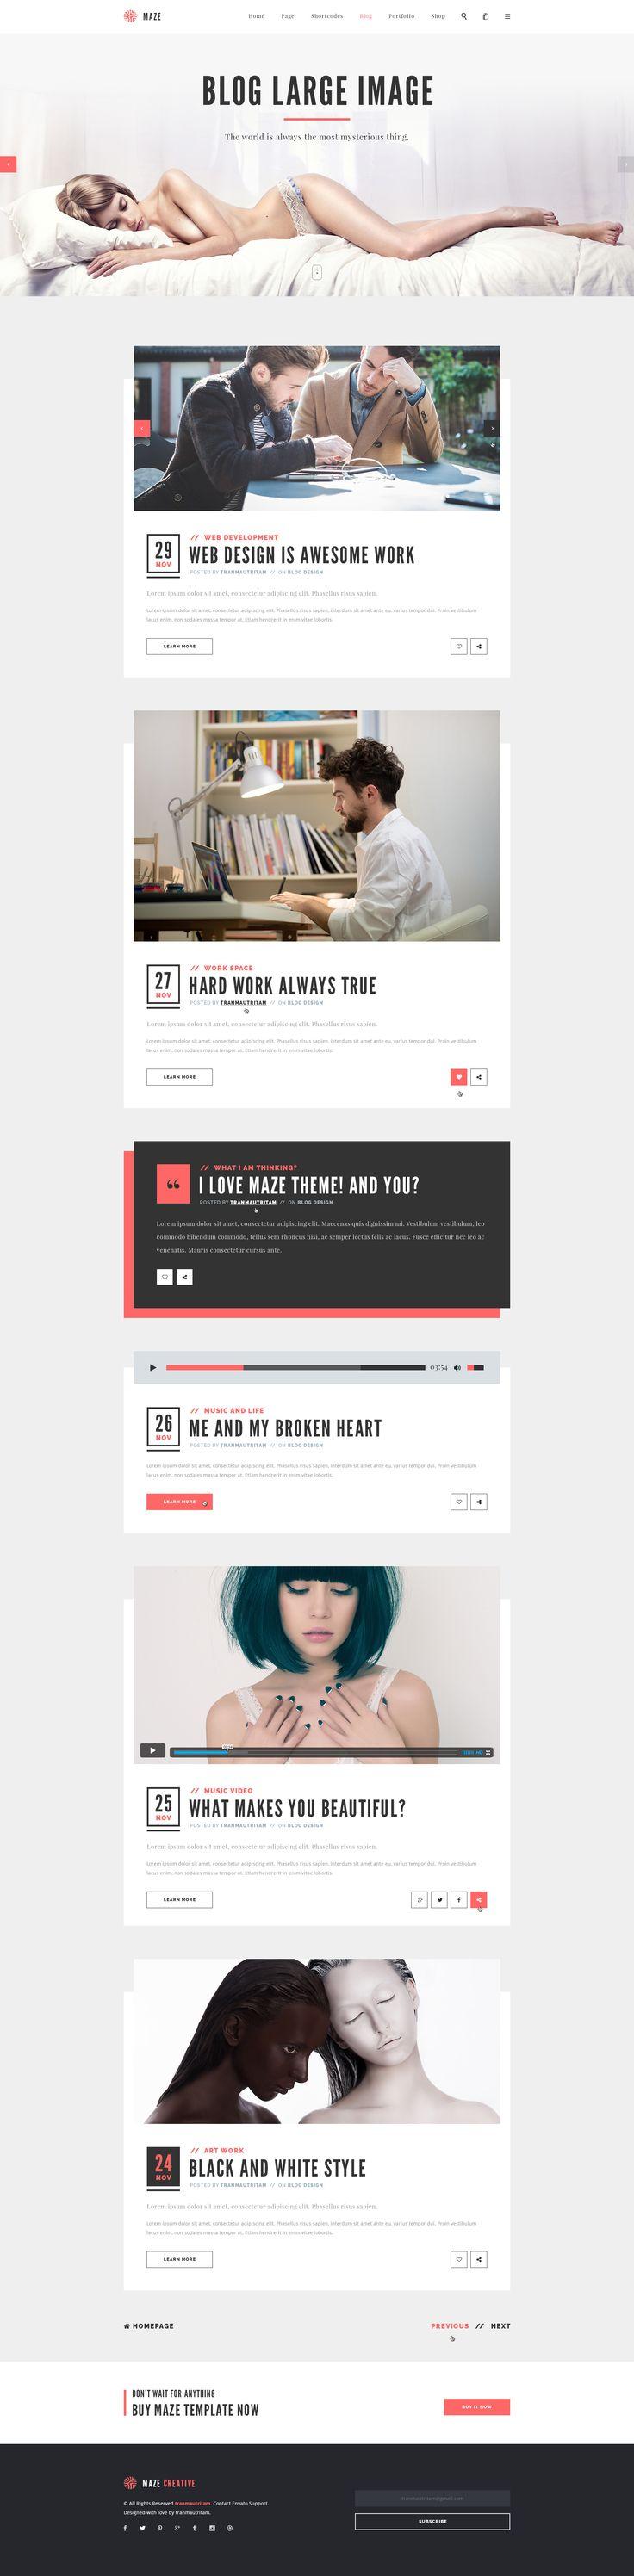 Maze   Creative Agency PSD Template UI #mobile #nike #digital #mobile #ui #uidesign #uxdesign #mobileappui #UIUX#webdesign #color #photography #typography #ResponsiveDesign #Web #UI #UX #WordPress #Resposive Design #Website #Graphics